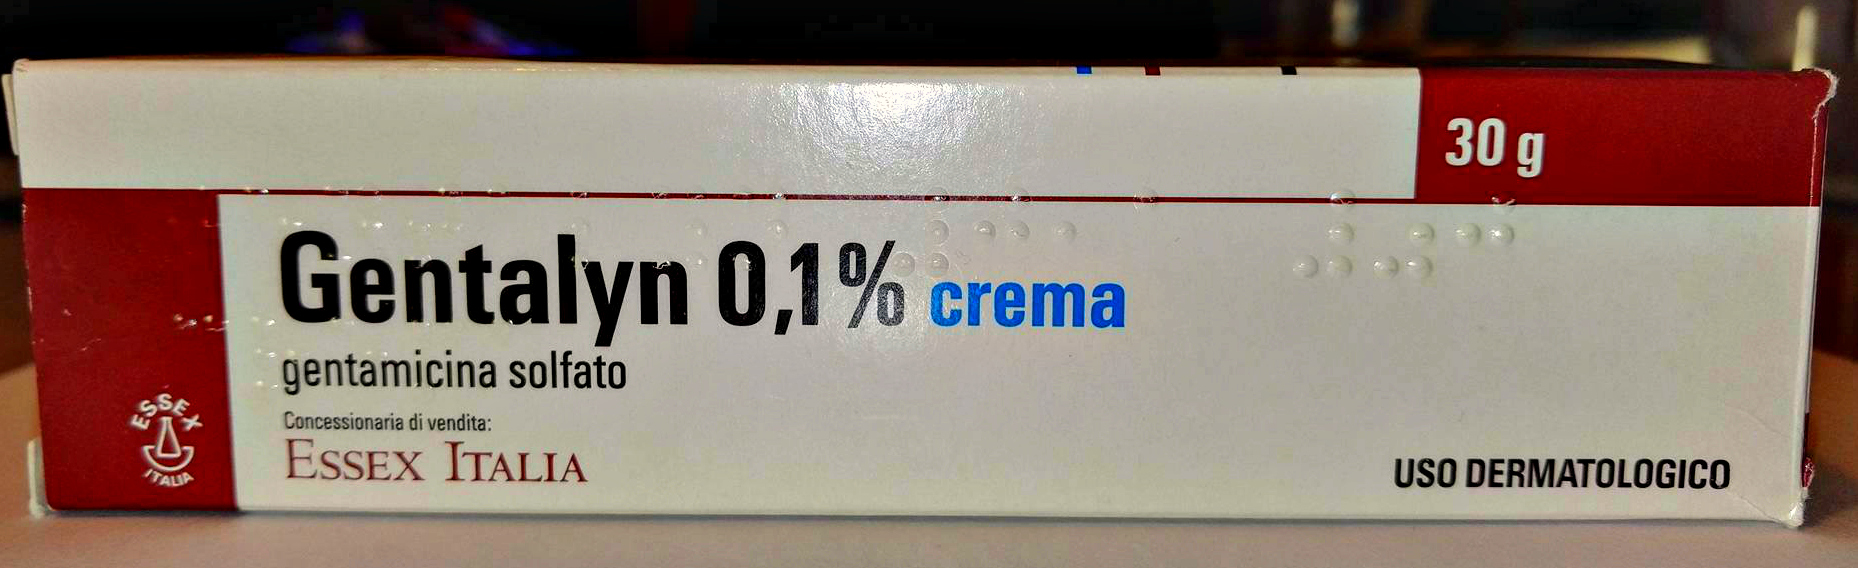 gentalyn crema